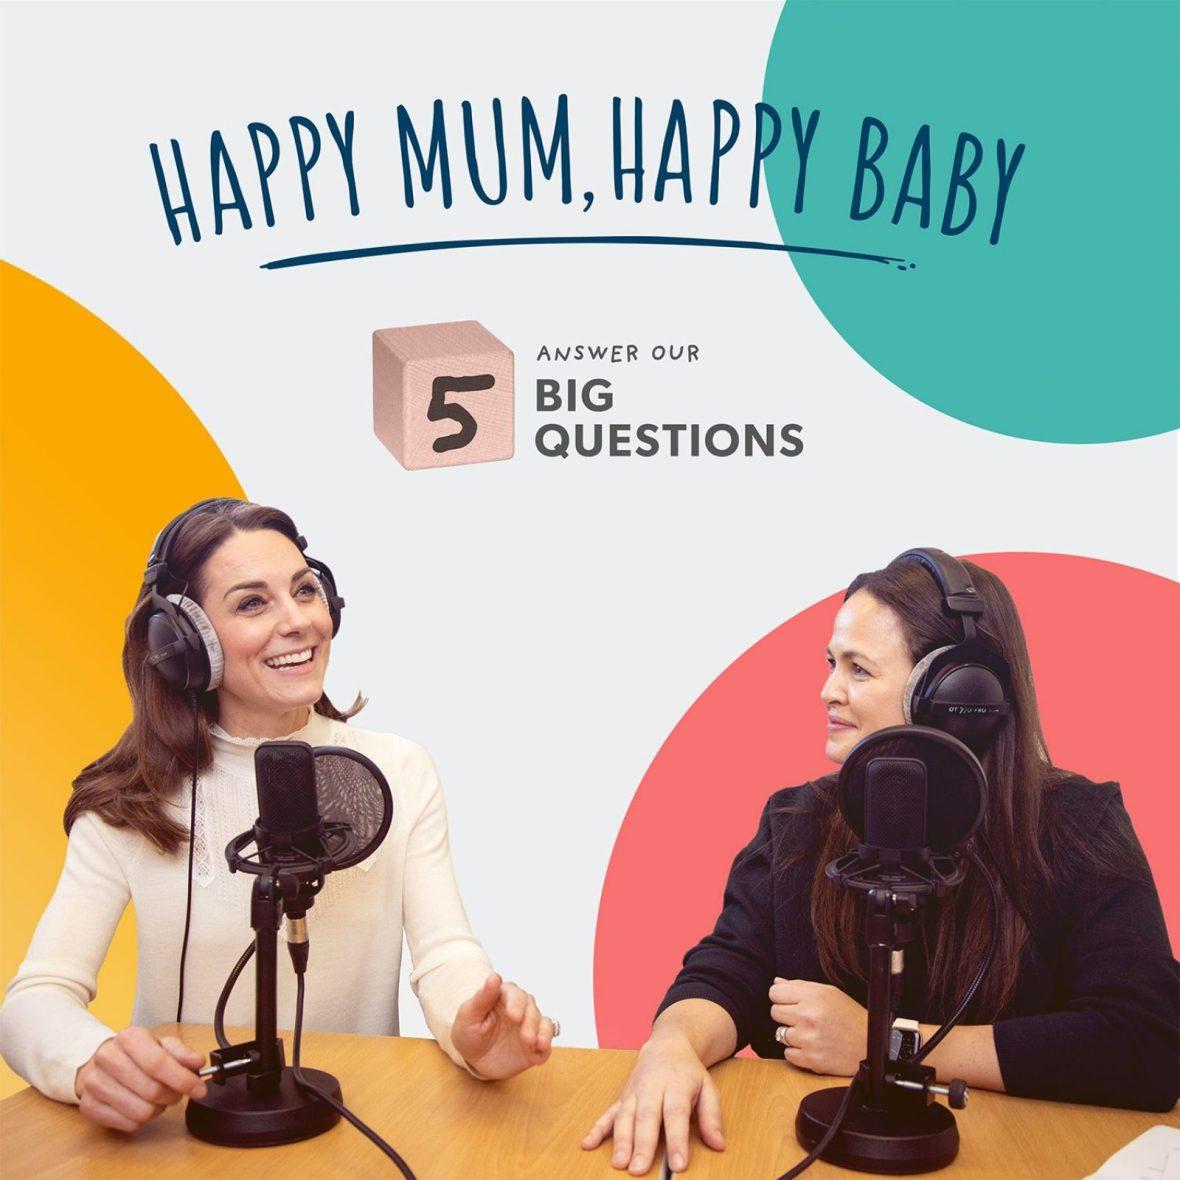 Happy Mum, Happy Baby: The Duchess of Cambridge transcript